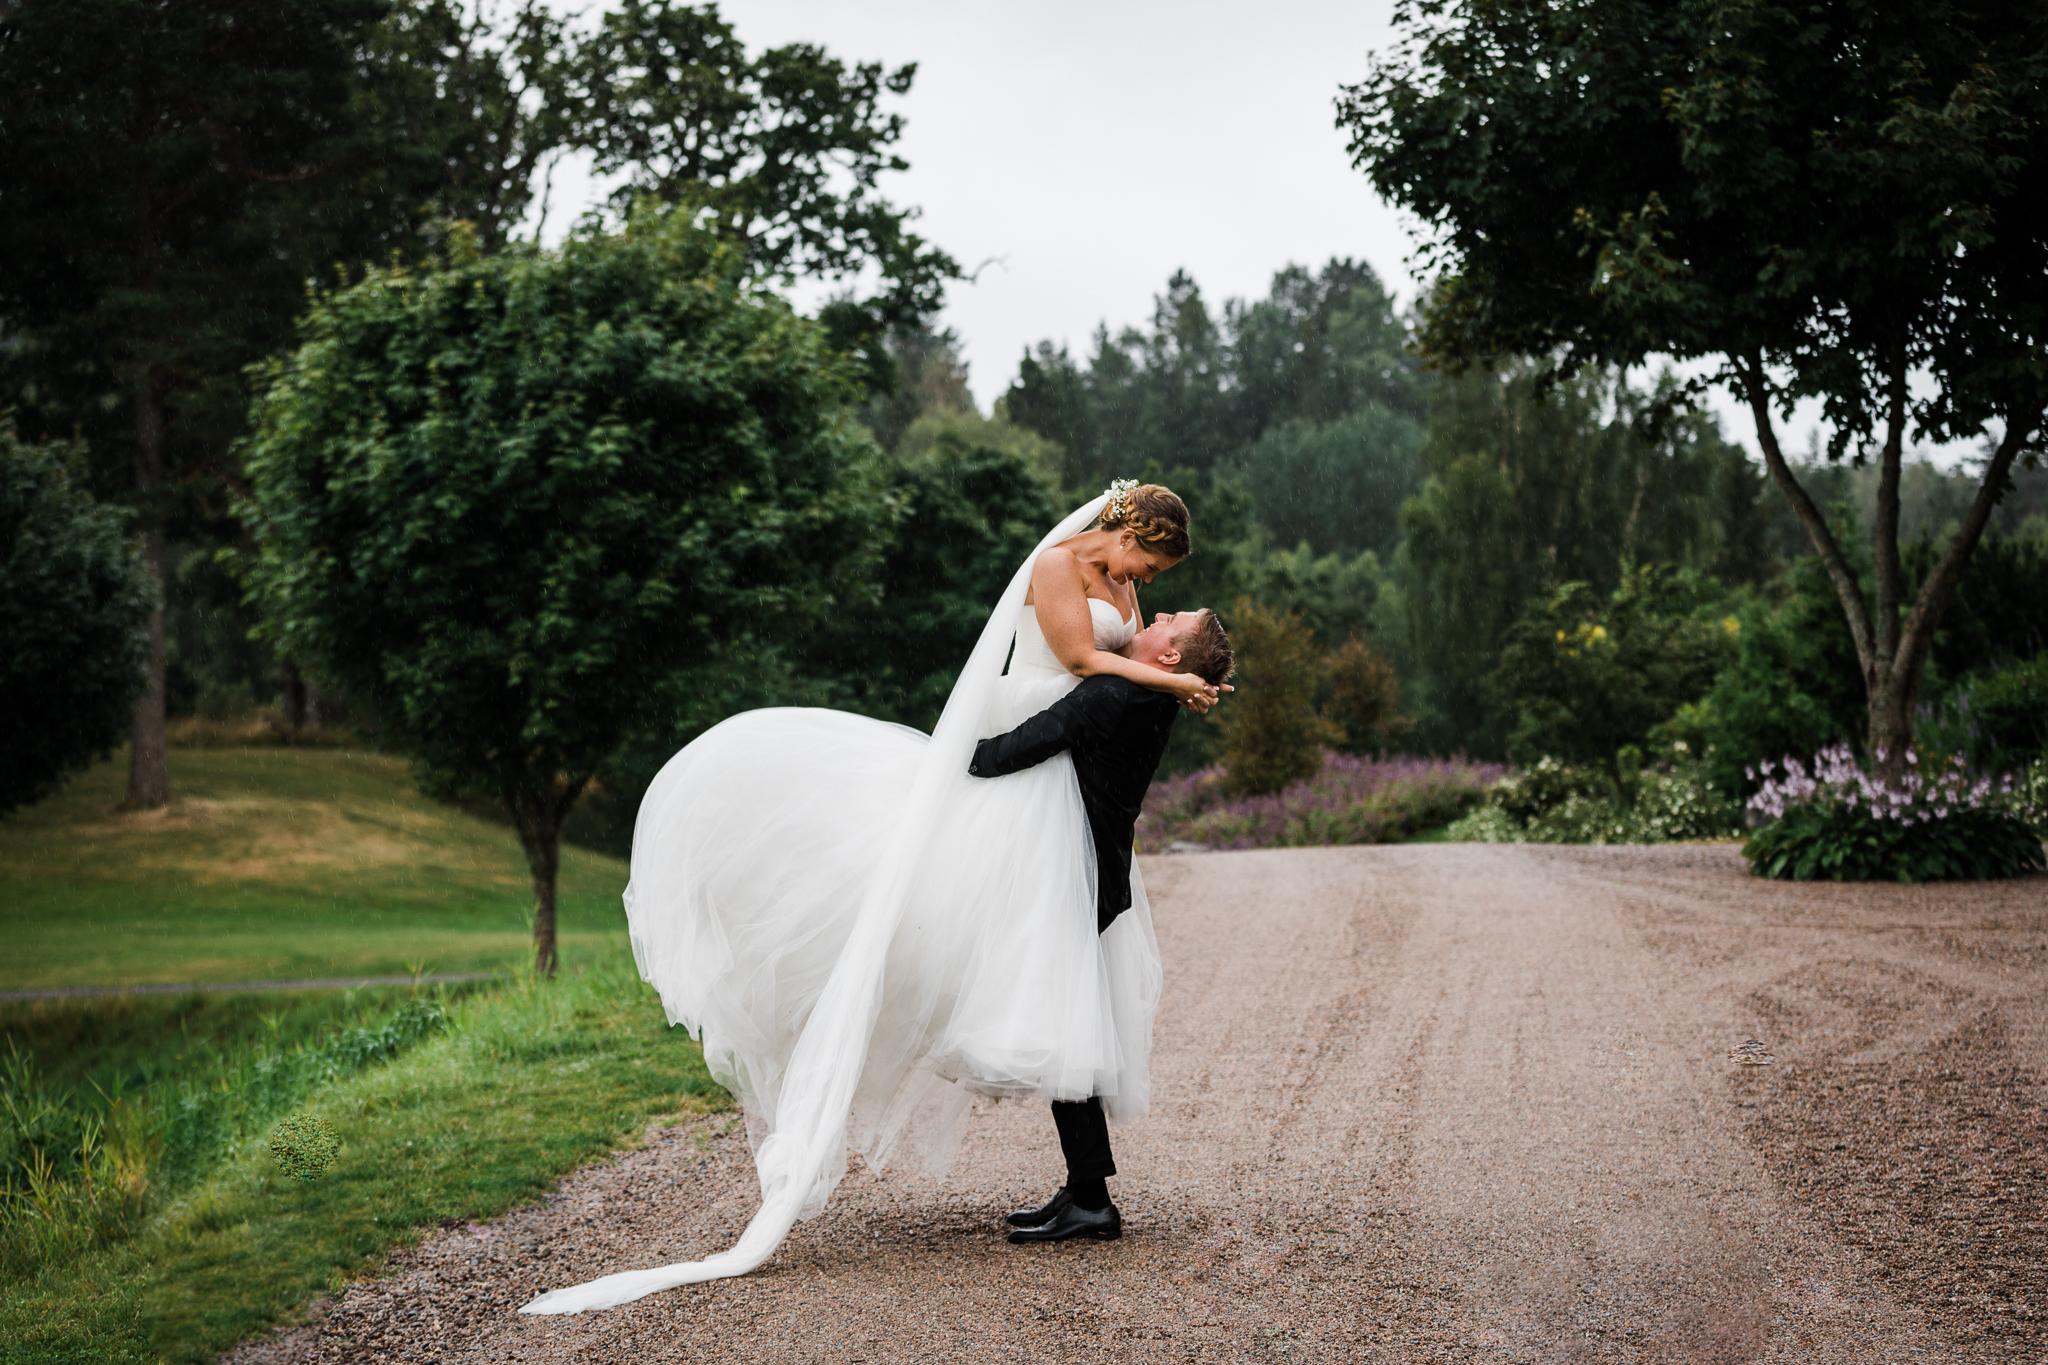 Bryllup_web5.jpg